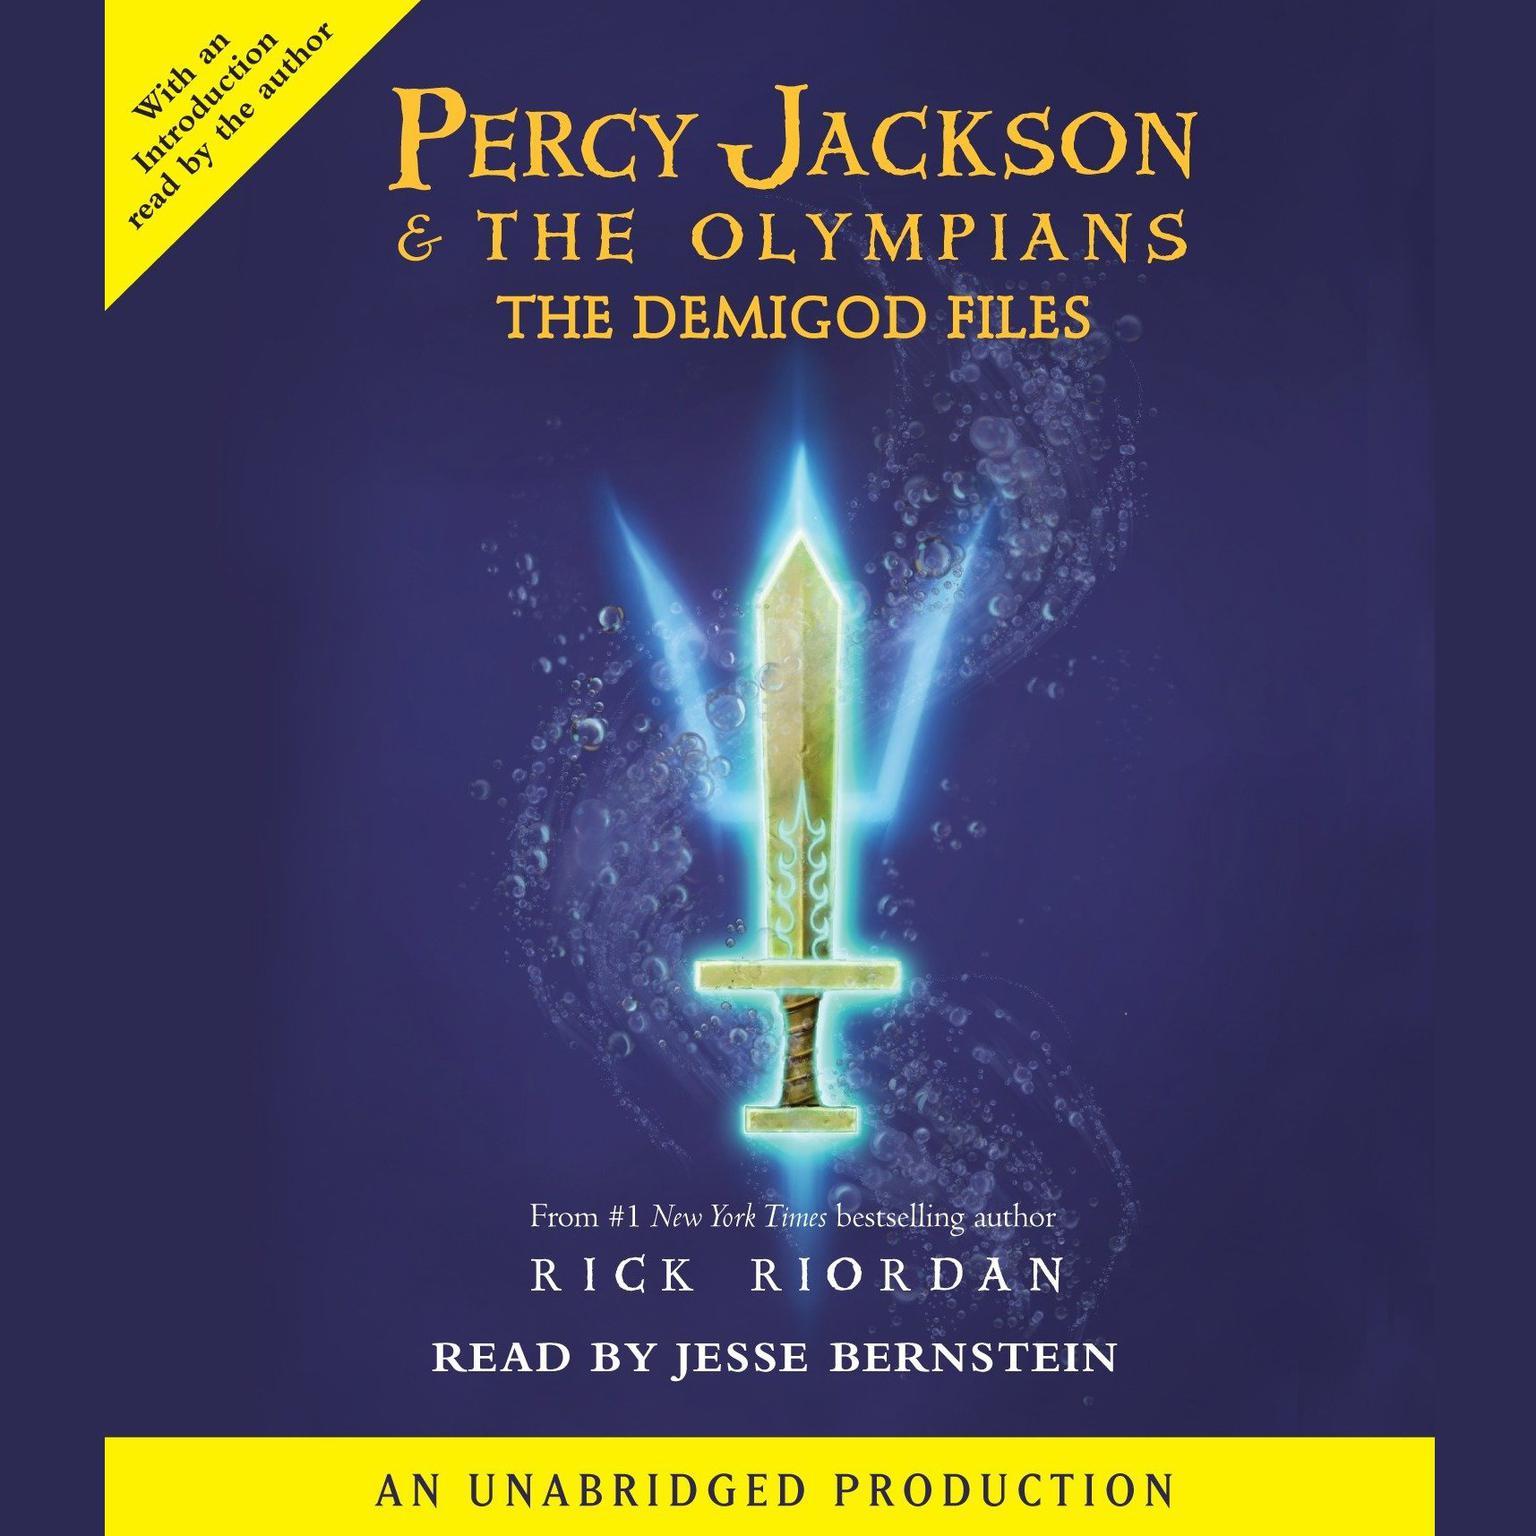 Percy Jackson The Demigod Files